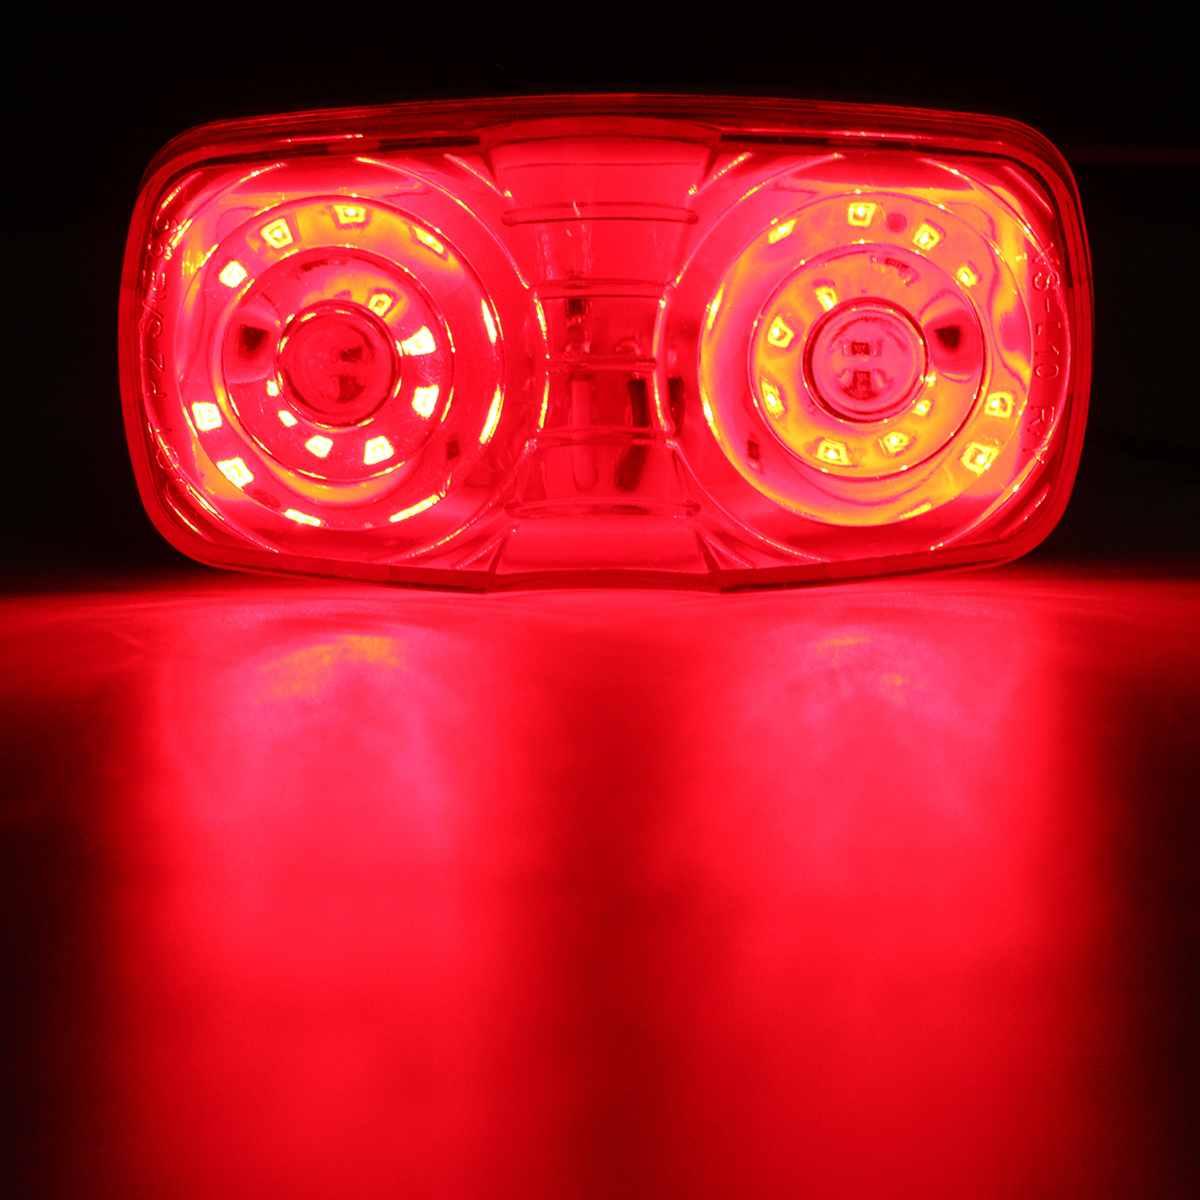 Hot DC 12V Trailer Truck Side Marker Clearance Light Double Bullseye Red Lens 10 Diodes Waterproof